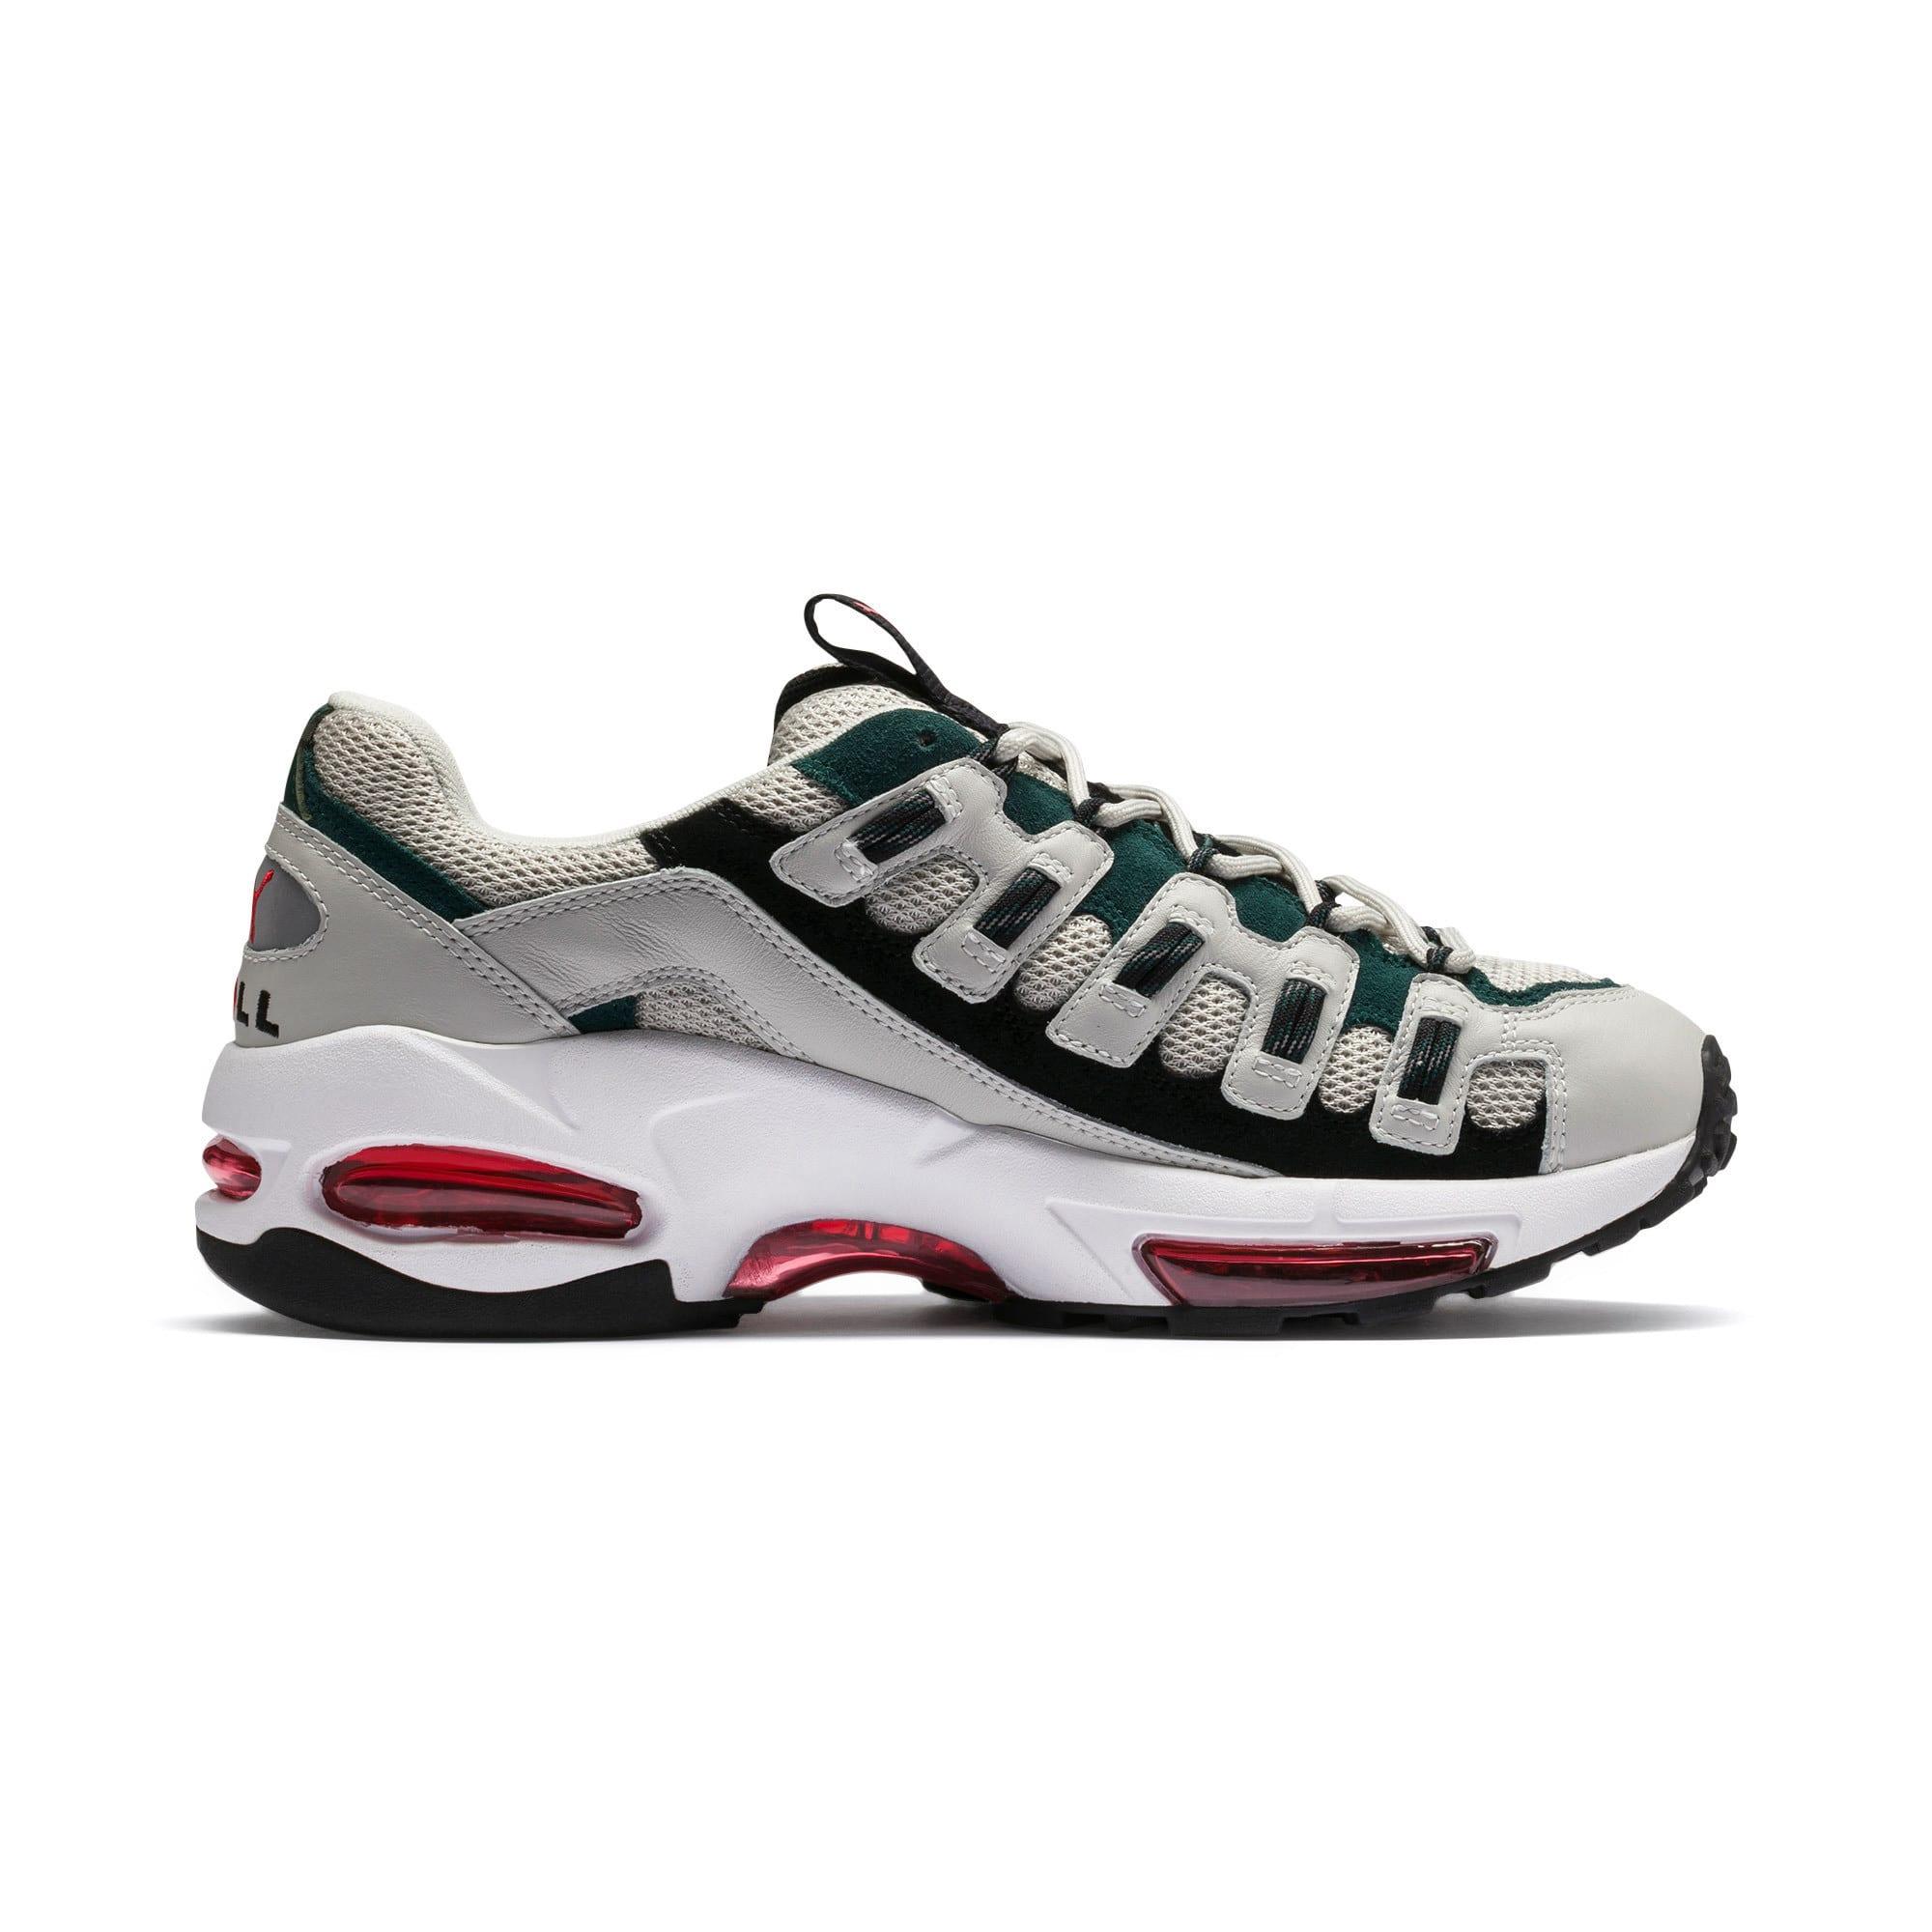 Thumbnail 5 of CELL Endura Sneakers, Glacier Gray-High Risk Red, medium